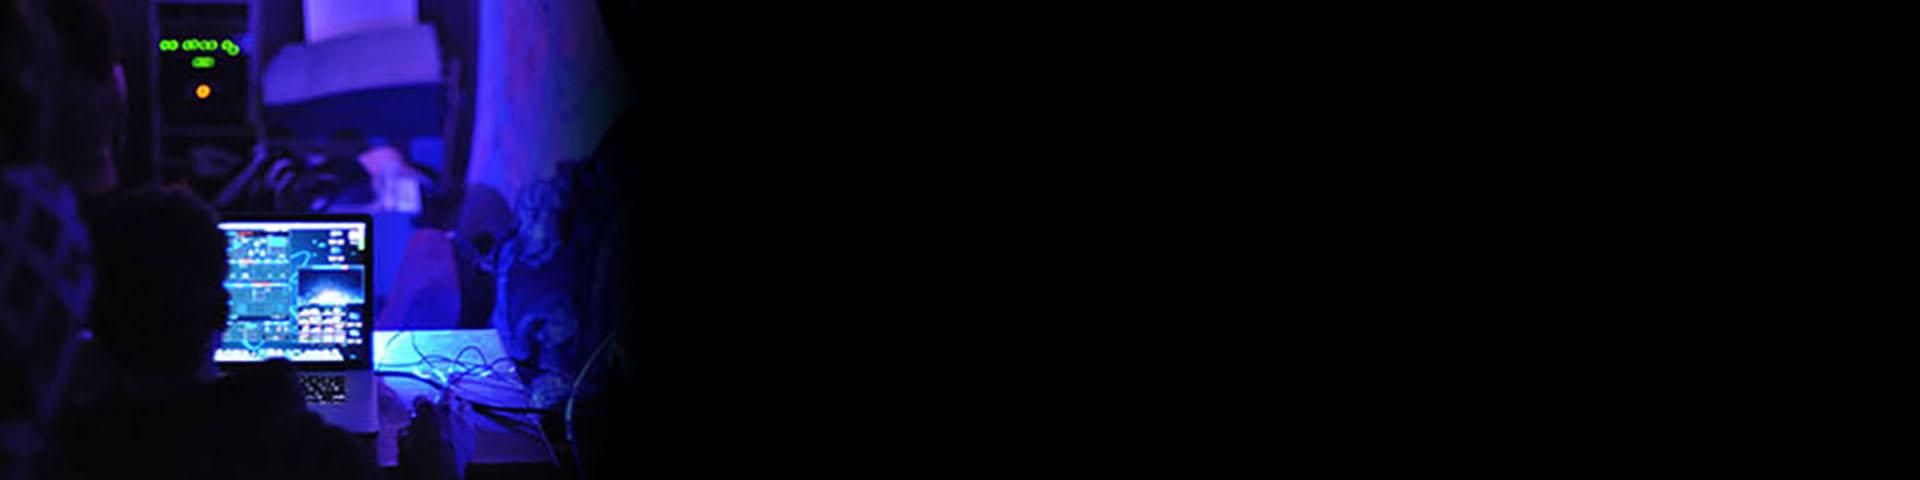 Ant's Digital